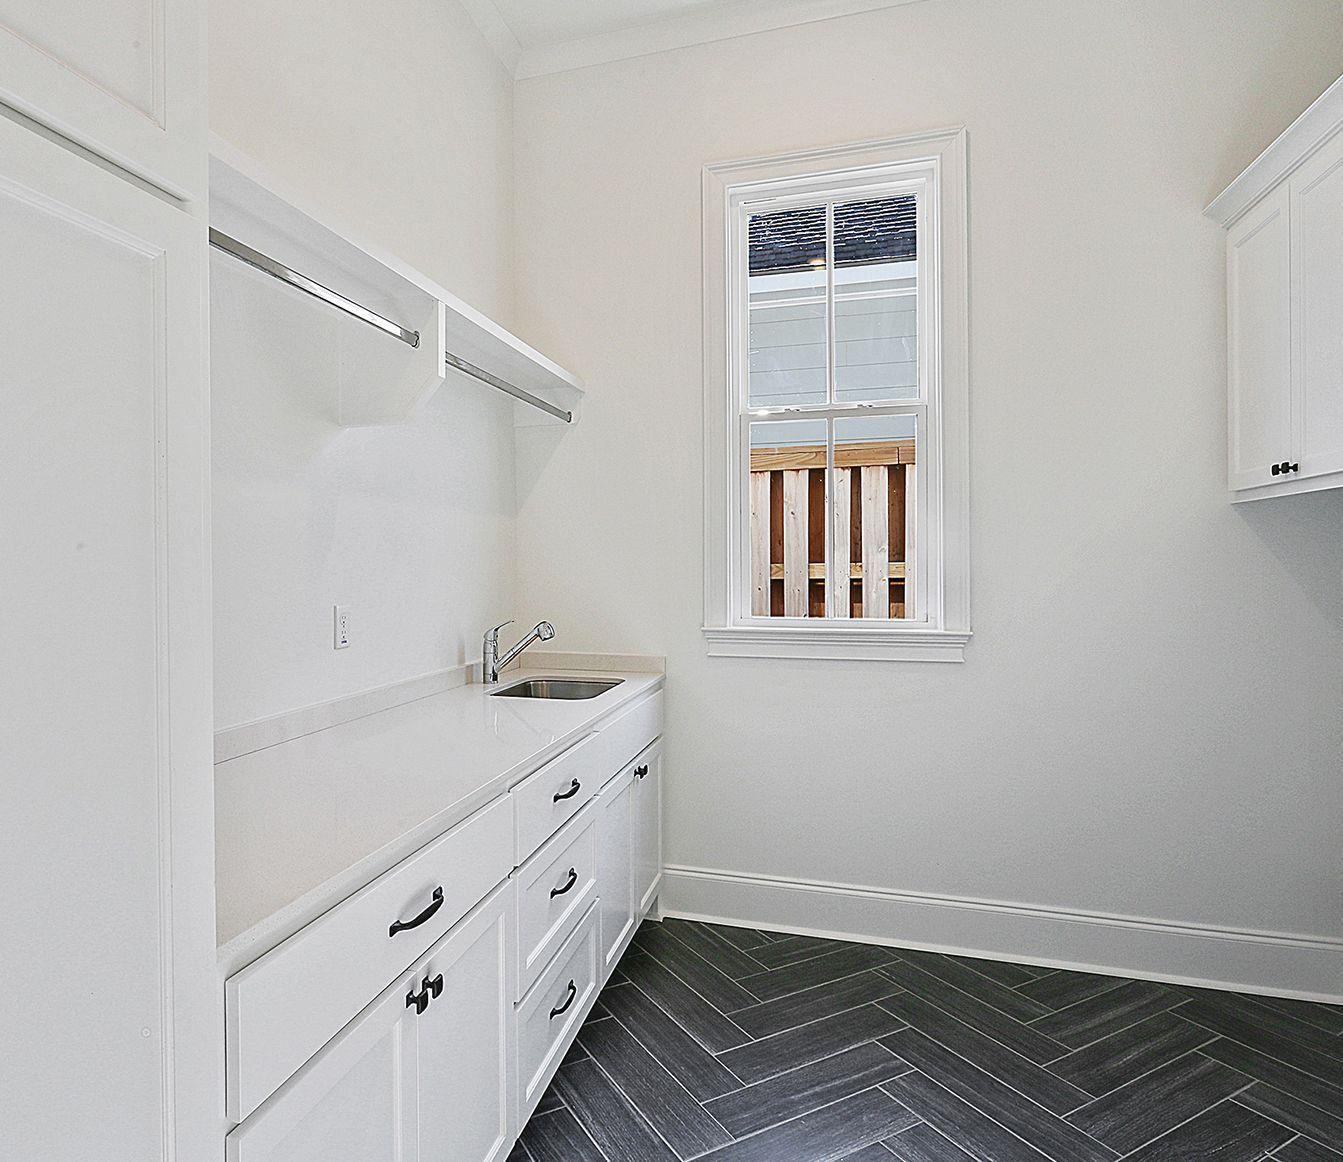 Bardwell Homes - Baton Rouge, LA | Laundry room built ins ...